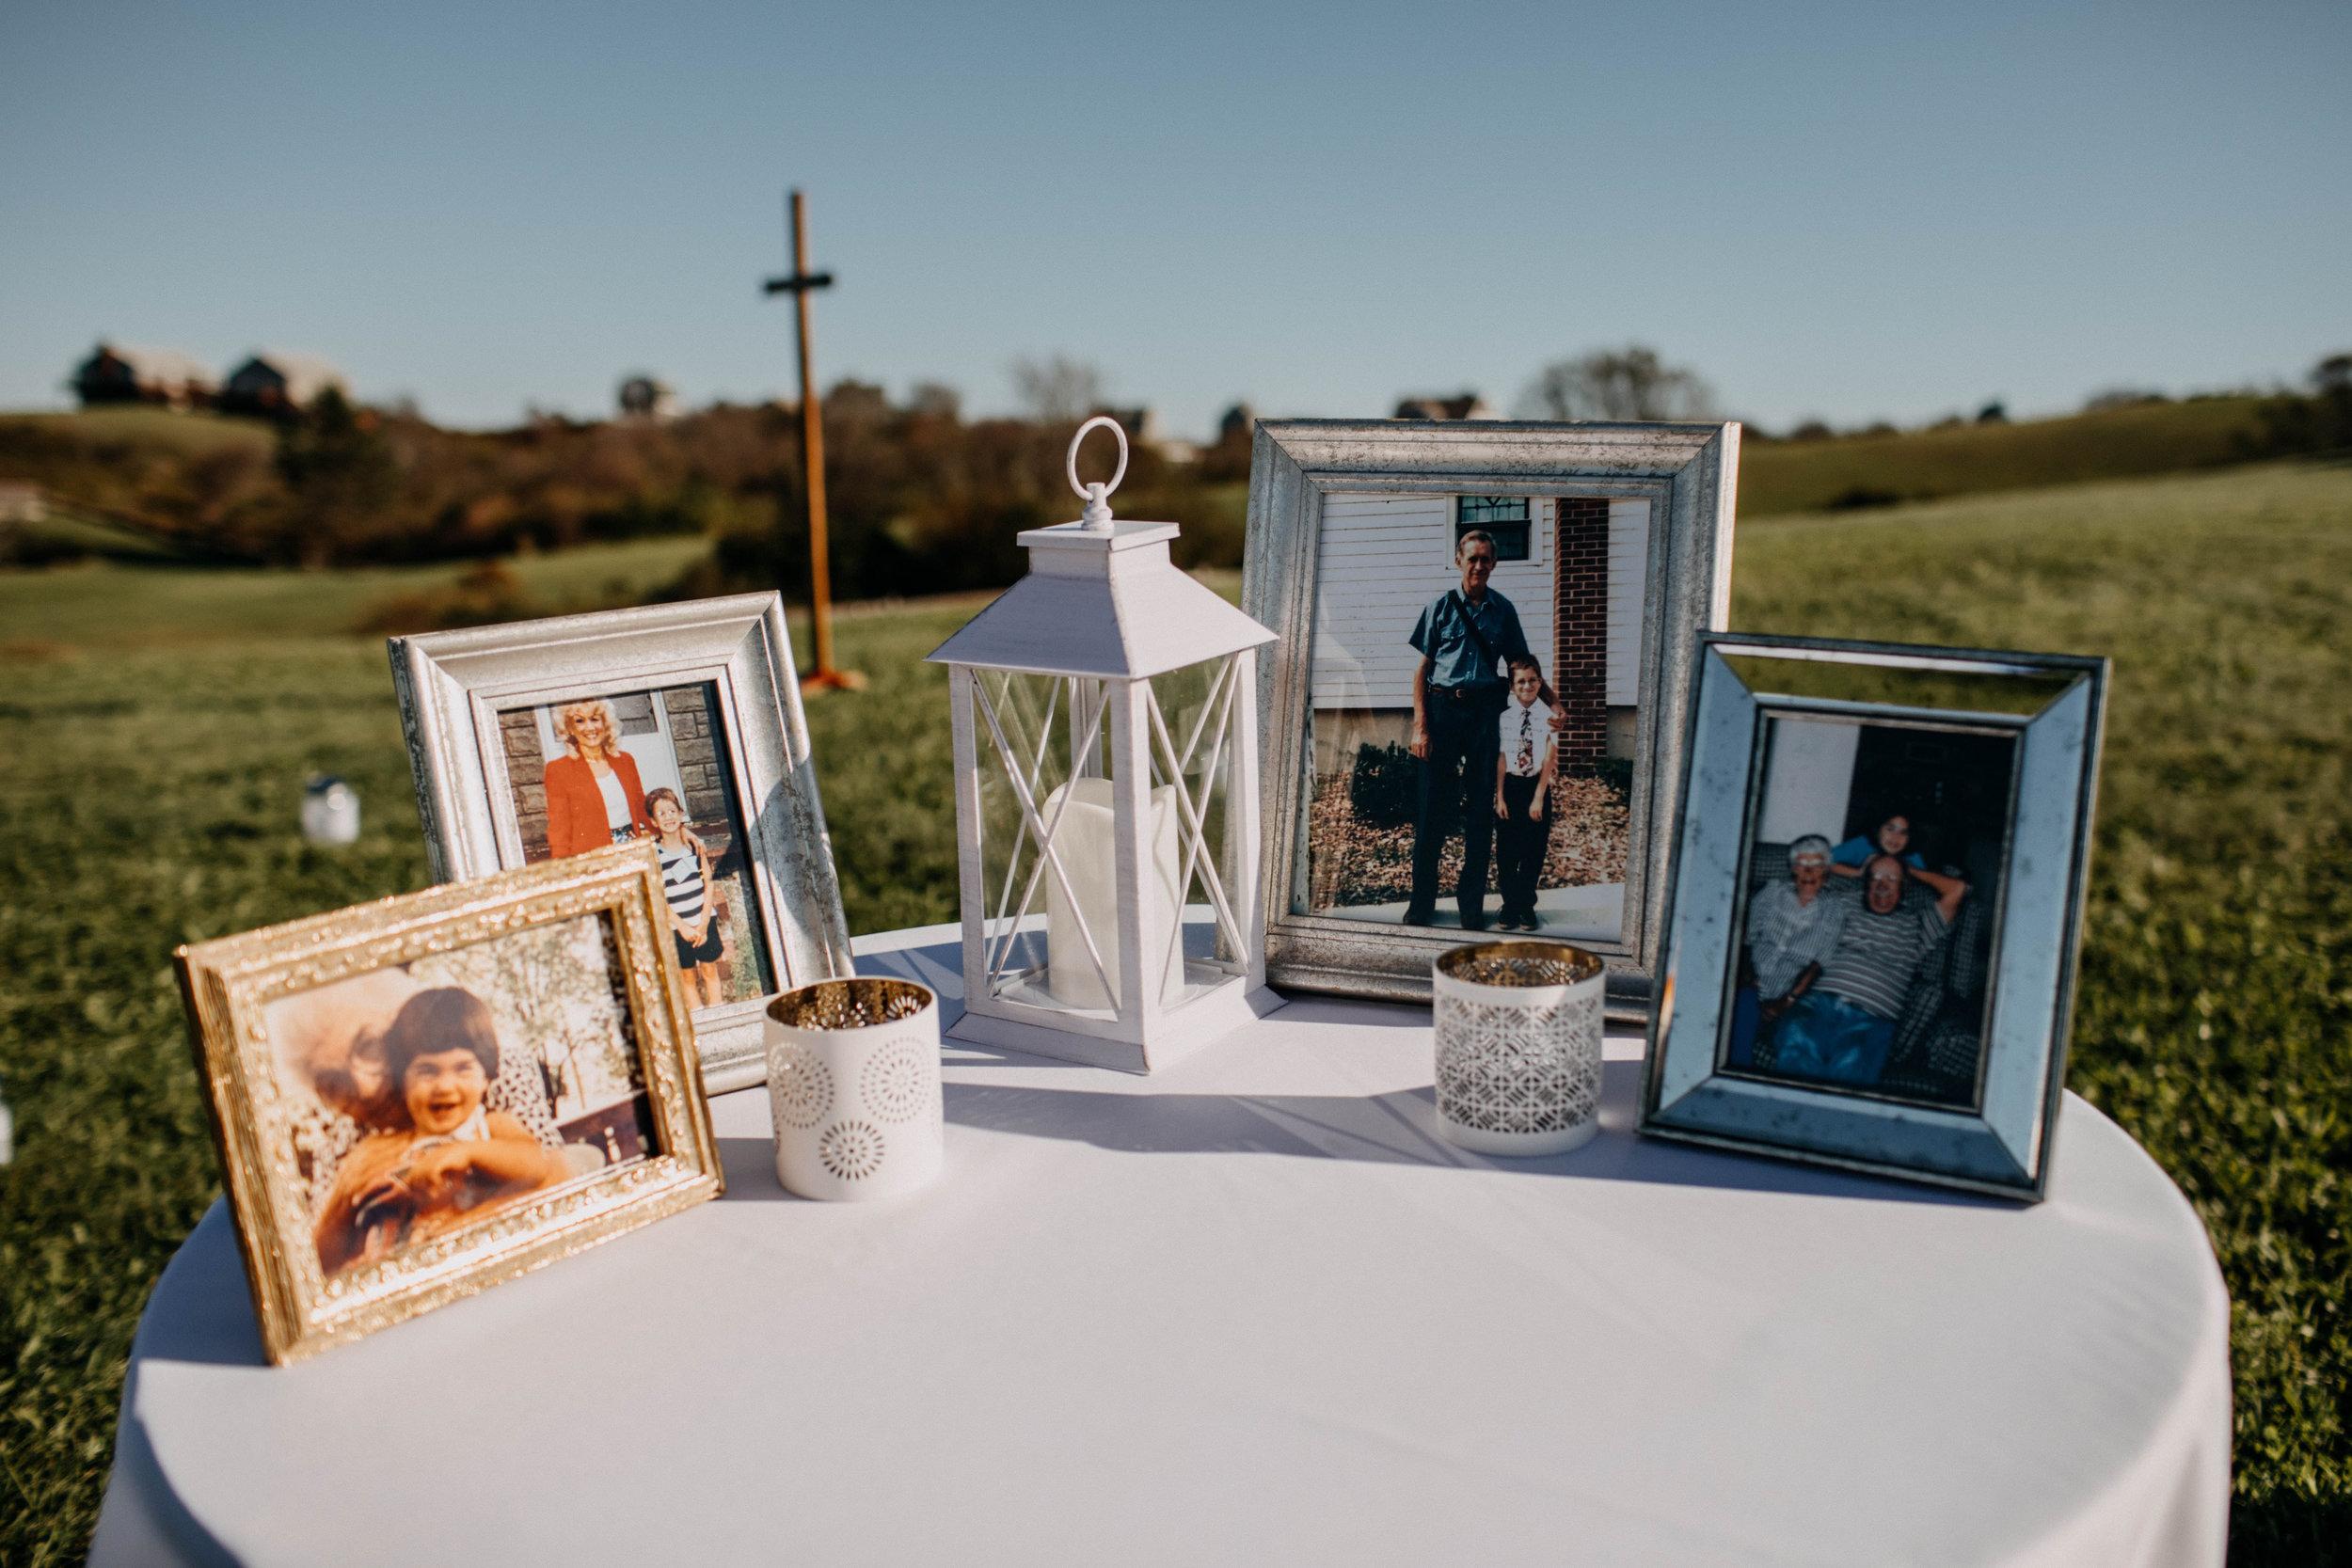 intimate block island rhode island wedding rose farm inn wedding east coast wedding photographer204.jpg